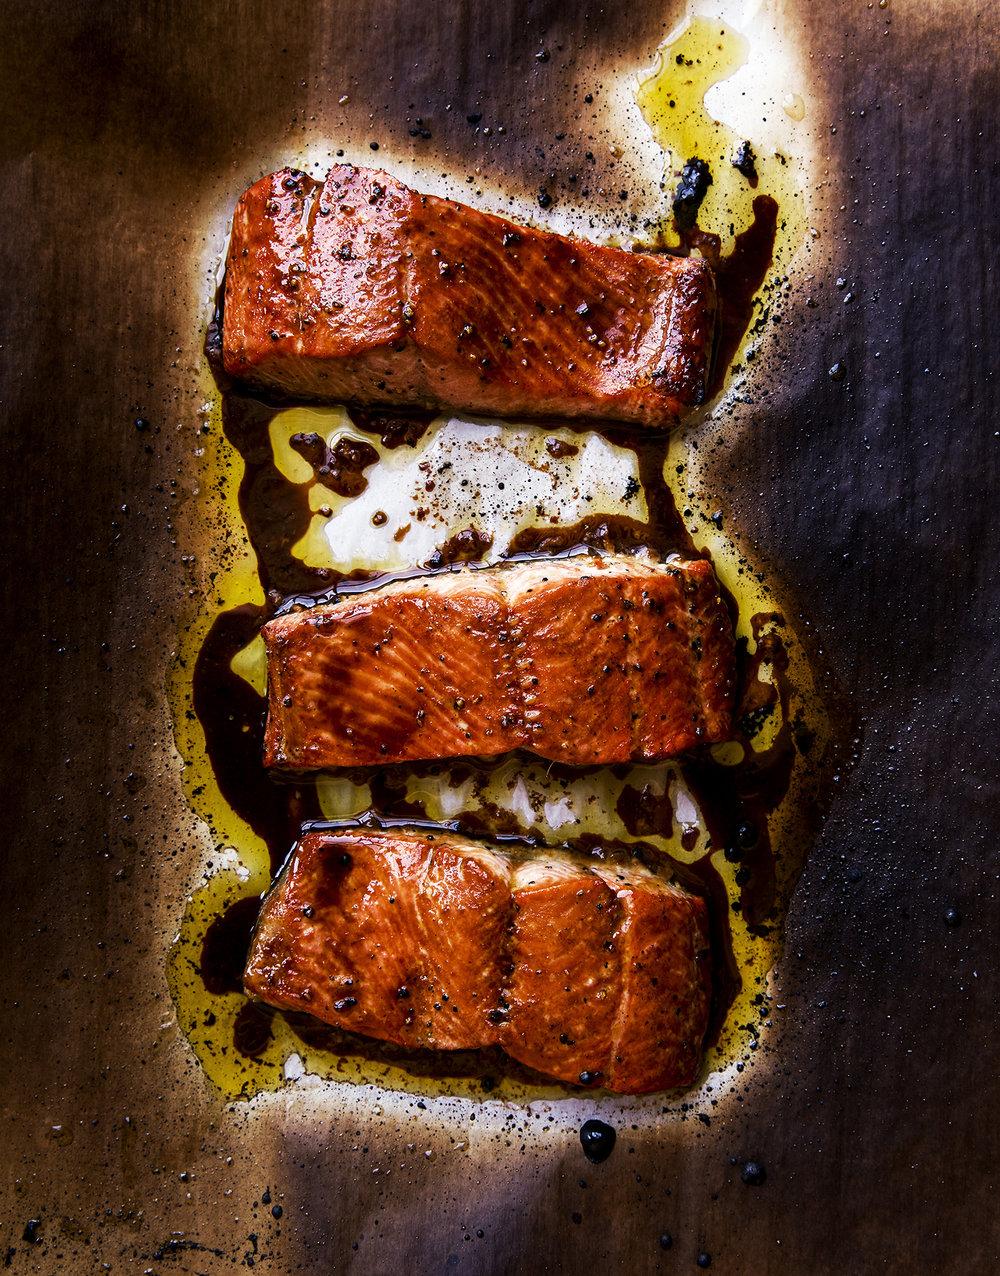 Burggraaf_Charity-Salmon.jpg